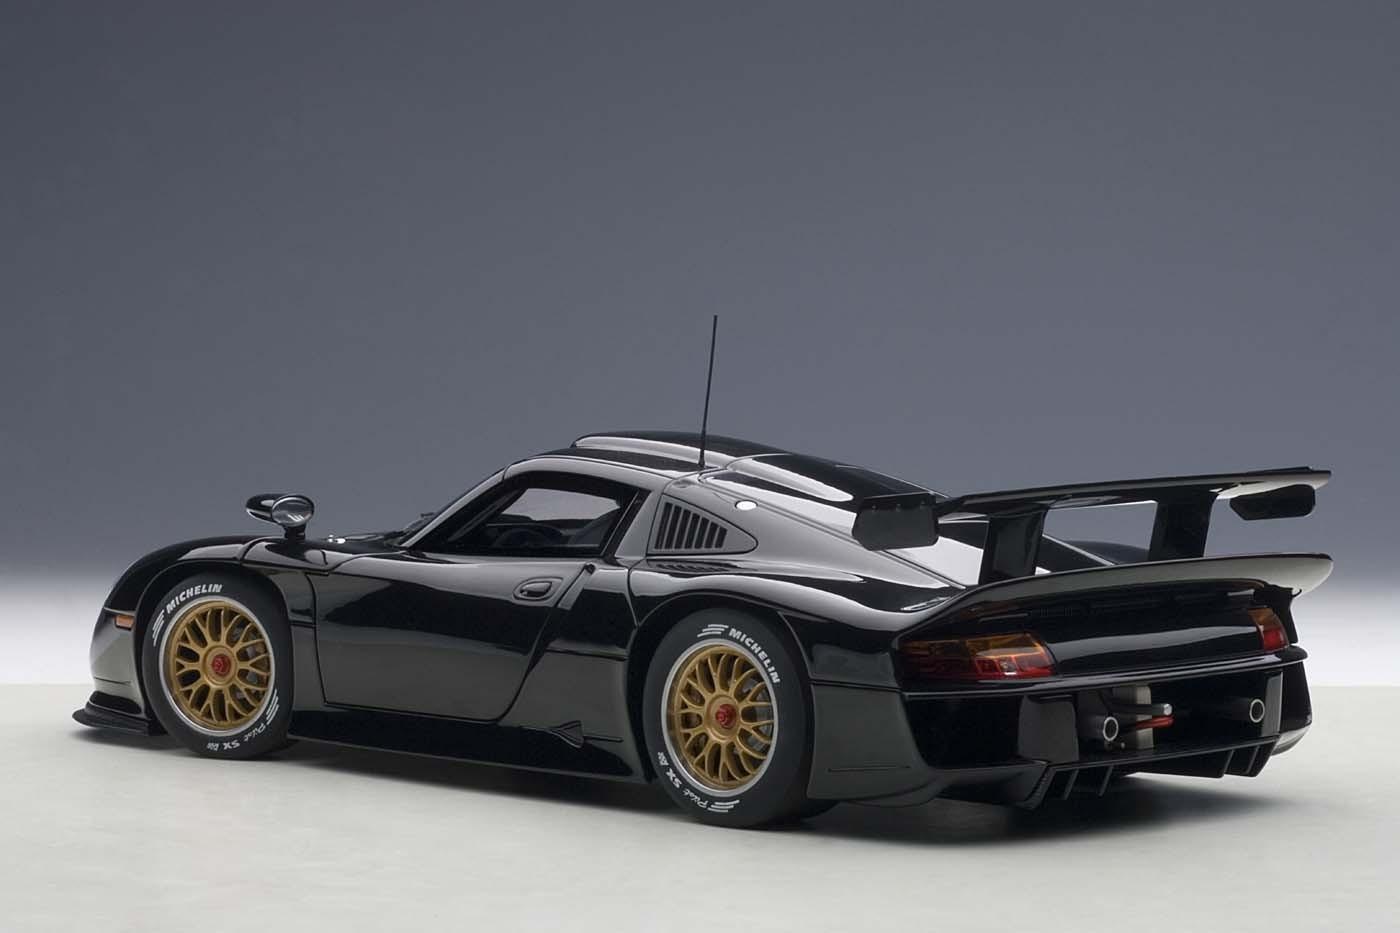 Highly Detailed Autoart Diecast Model Car Black Porsche